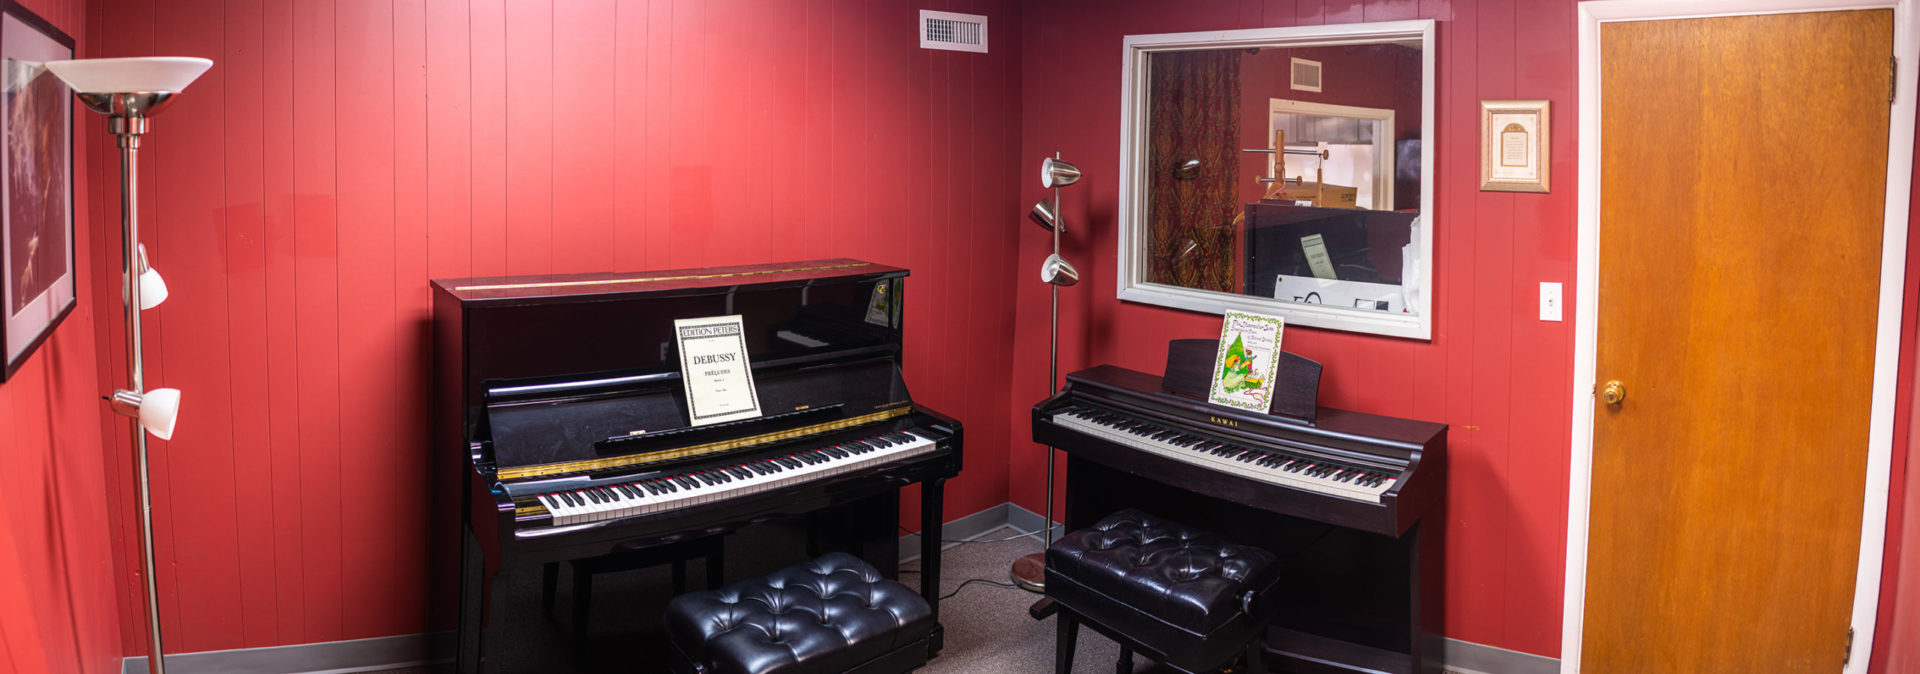 portland-piano-lessons-piano-room-at-michelles-piano-in-portland-or-pic2